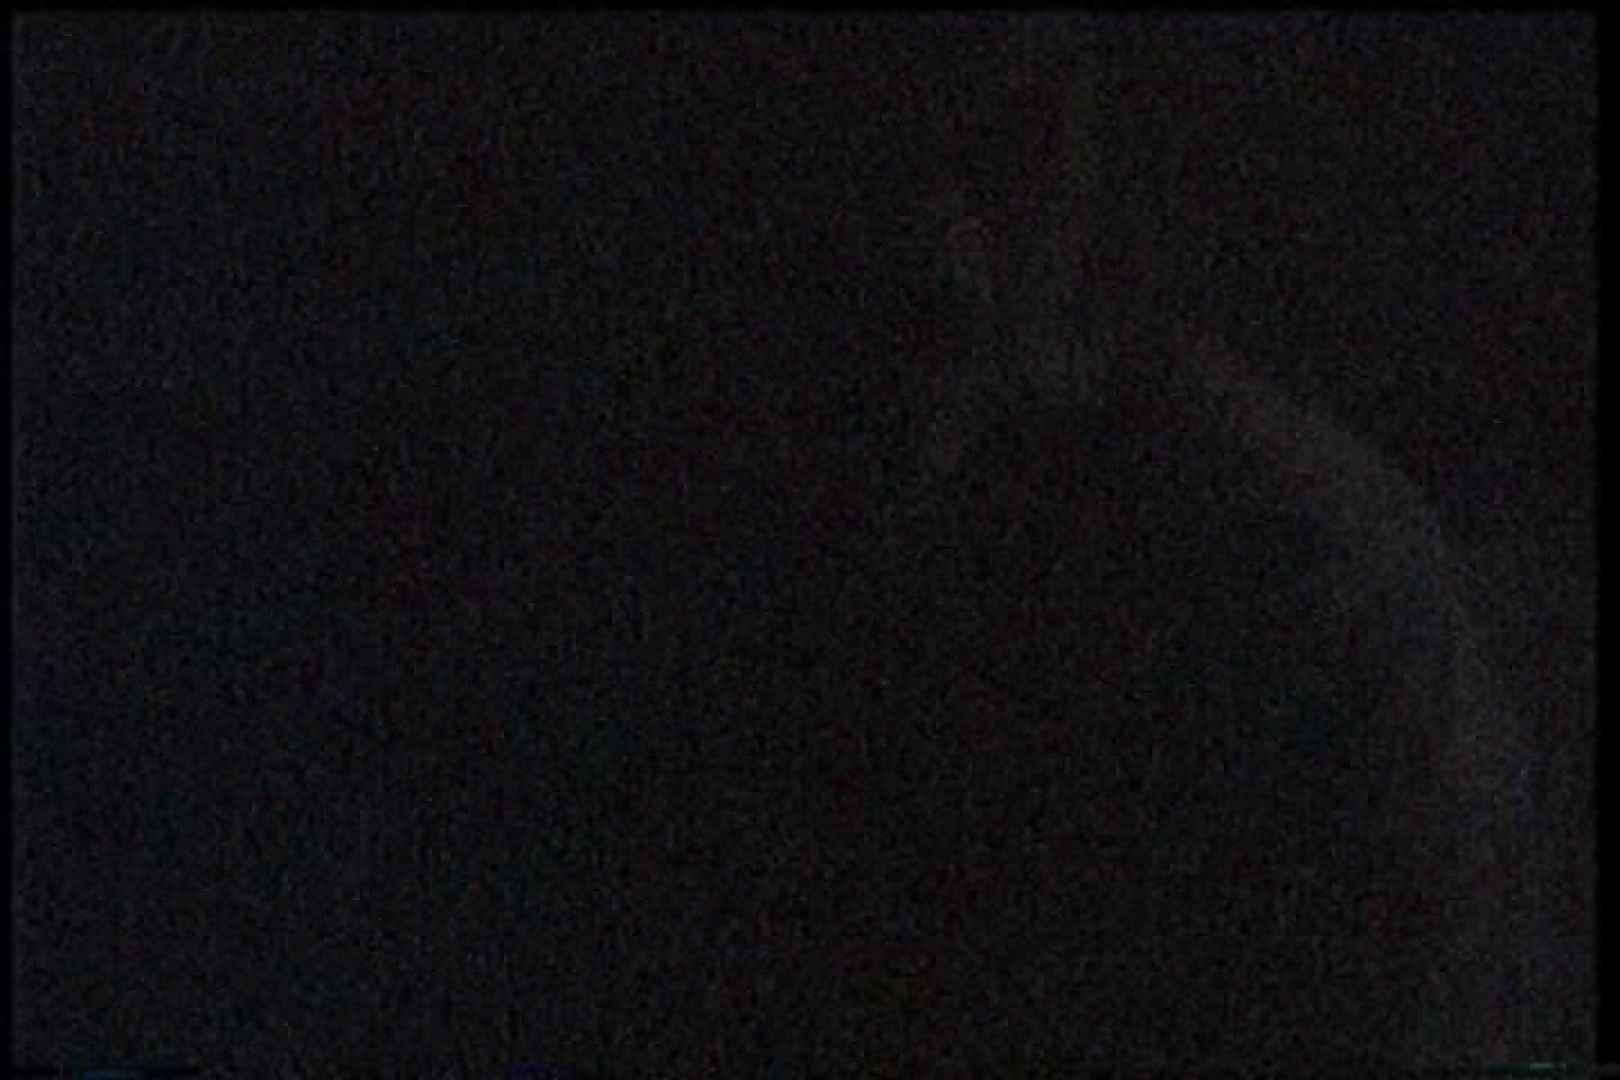 充血監督の深夜の運動会Vol.179 OL女体  87連発 18